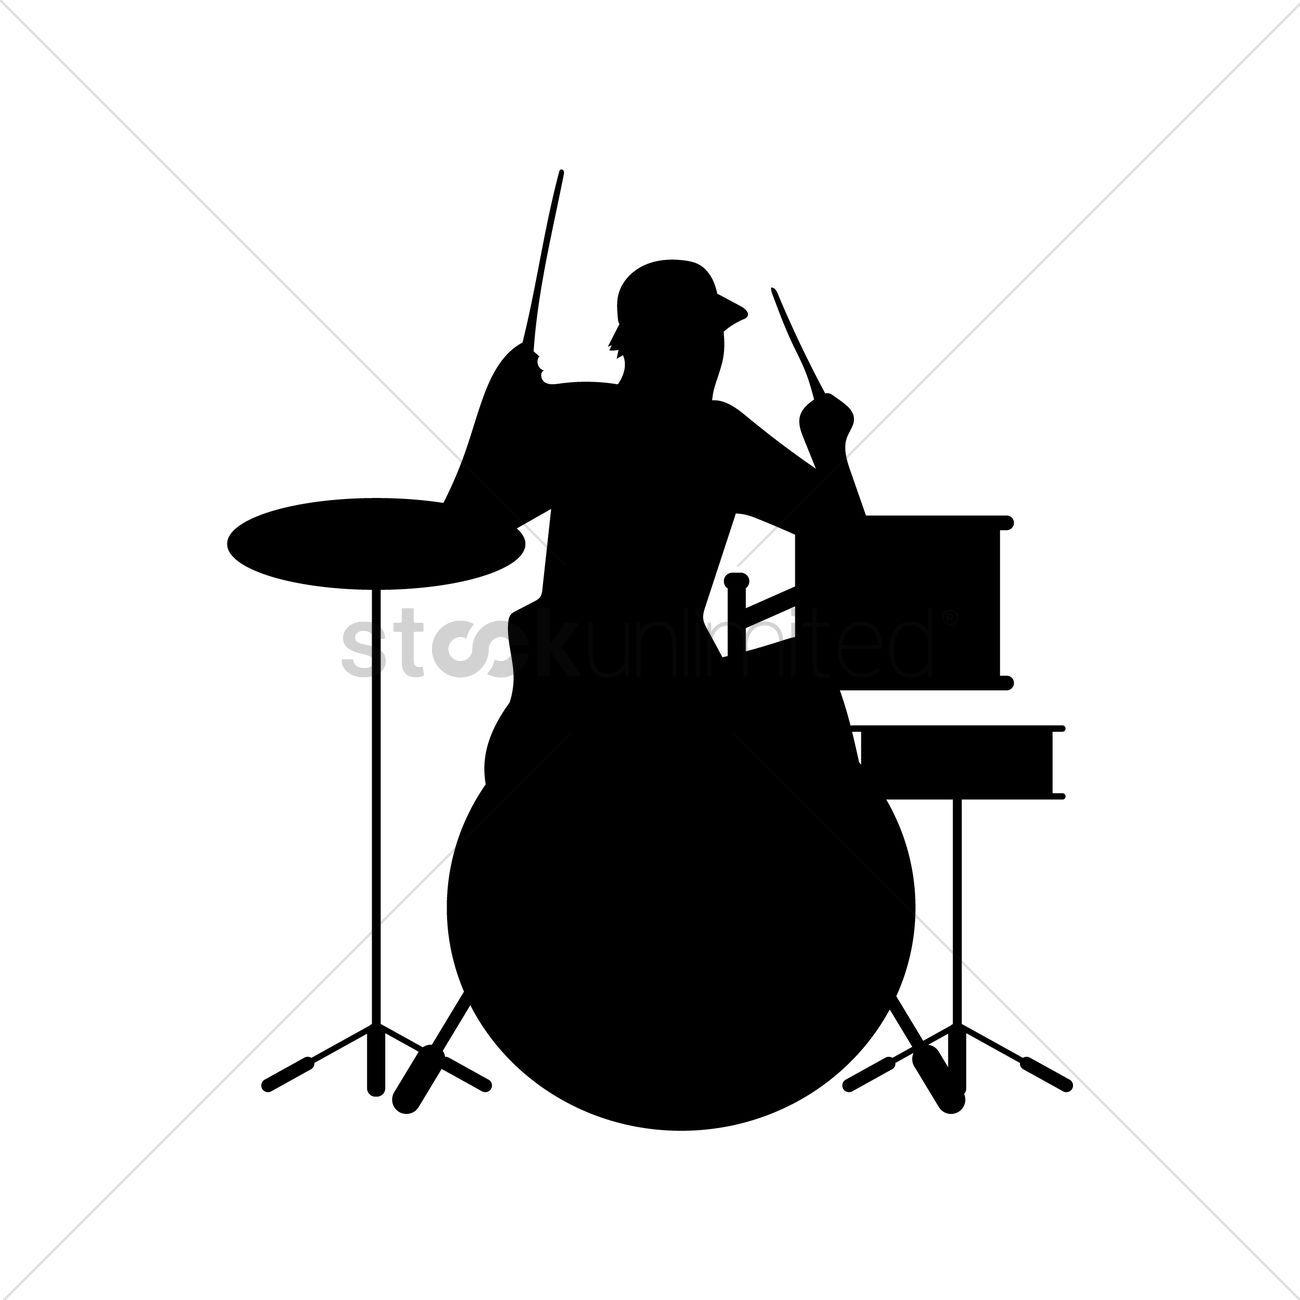 Car Tablet Vinyl Decal Musician Band Rockstar Guitarist Silhouette Shadow V.2